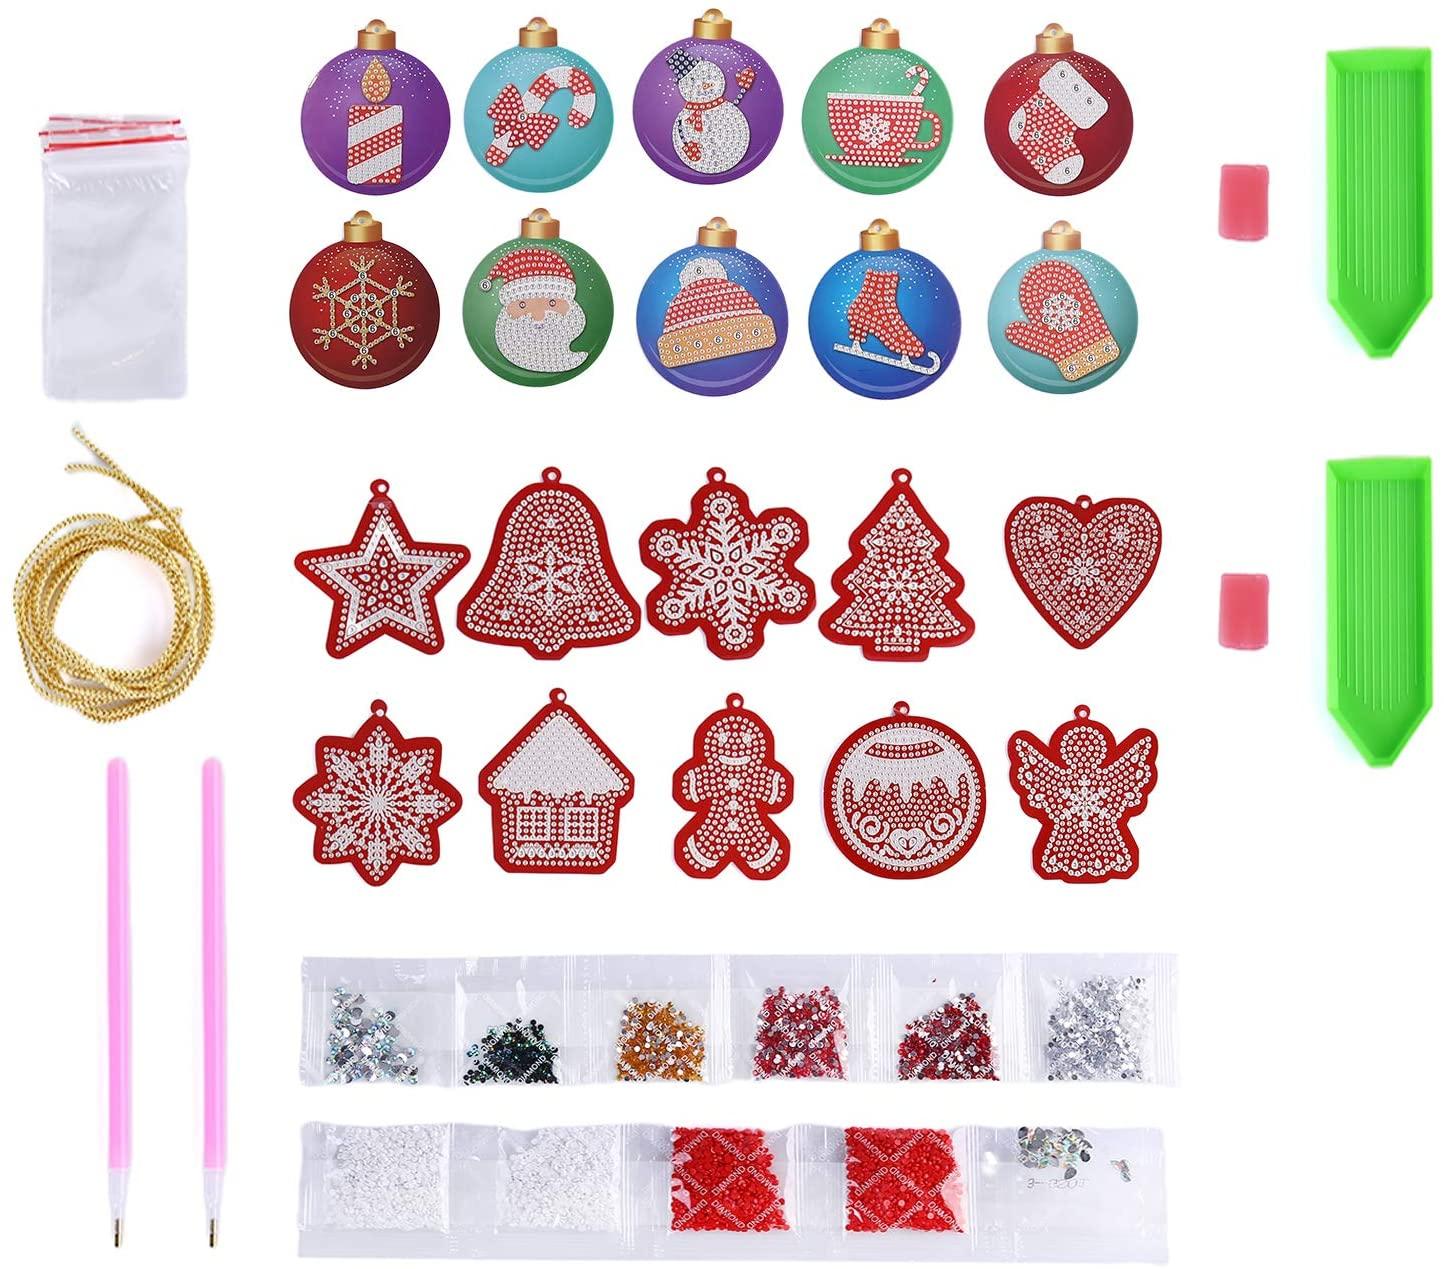 37YIMU DIY 5D Diamond Painting Christmas Hanging Ornament Kits, Handmade Christmas Tree Decor Pendant Hanging Decoration Arts Craft DIY Home Diamond Painting Kit